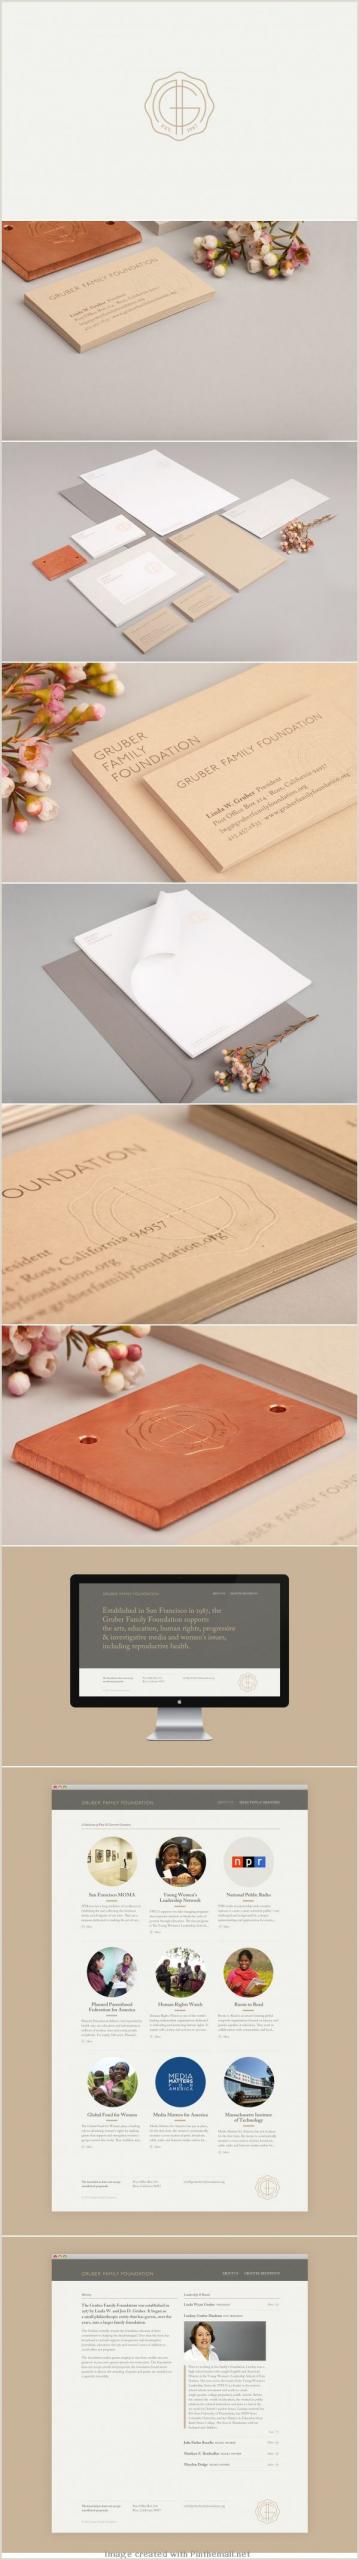 Traditional Business Card Design 14 Popular Hardwood Flooring Business Card Template